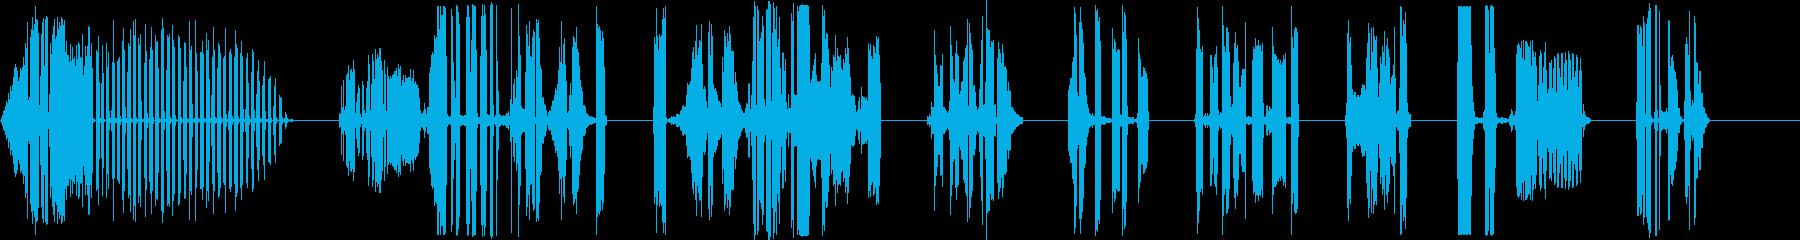 DJ Mad Computer X10の再生済みの波形